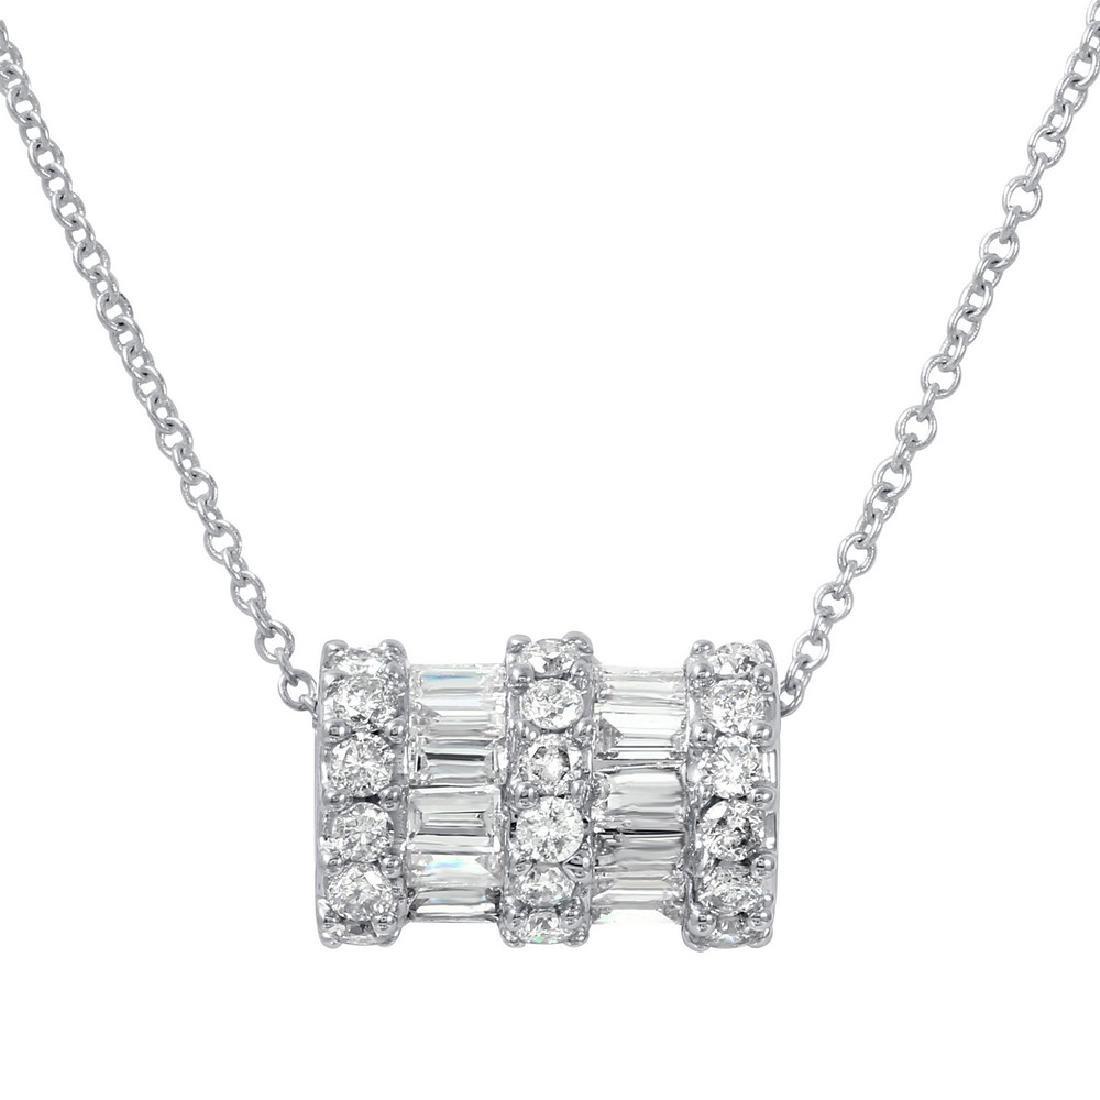 Genuine 0.75 TCW 14K White Gold Ladies Necklace